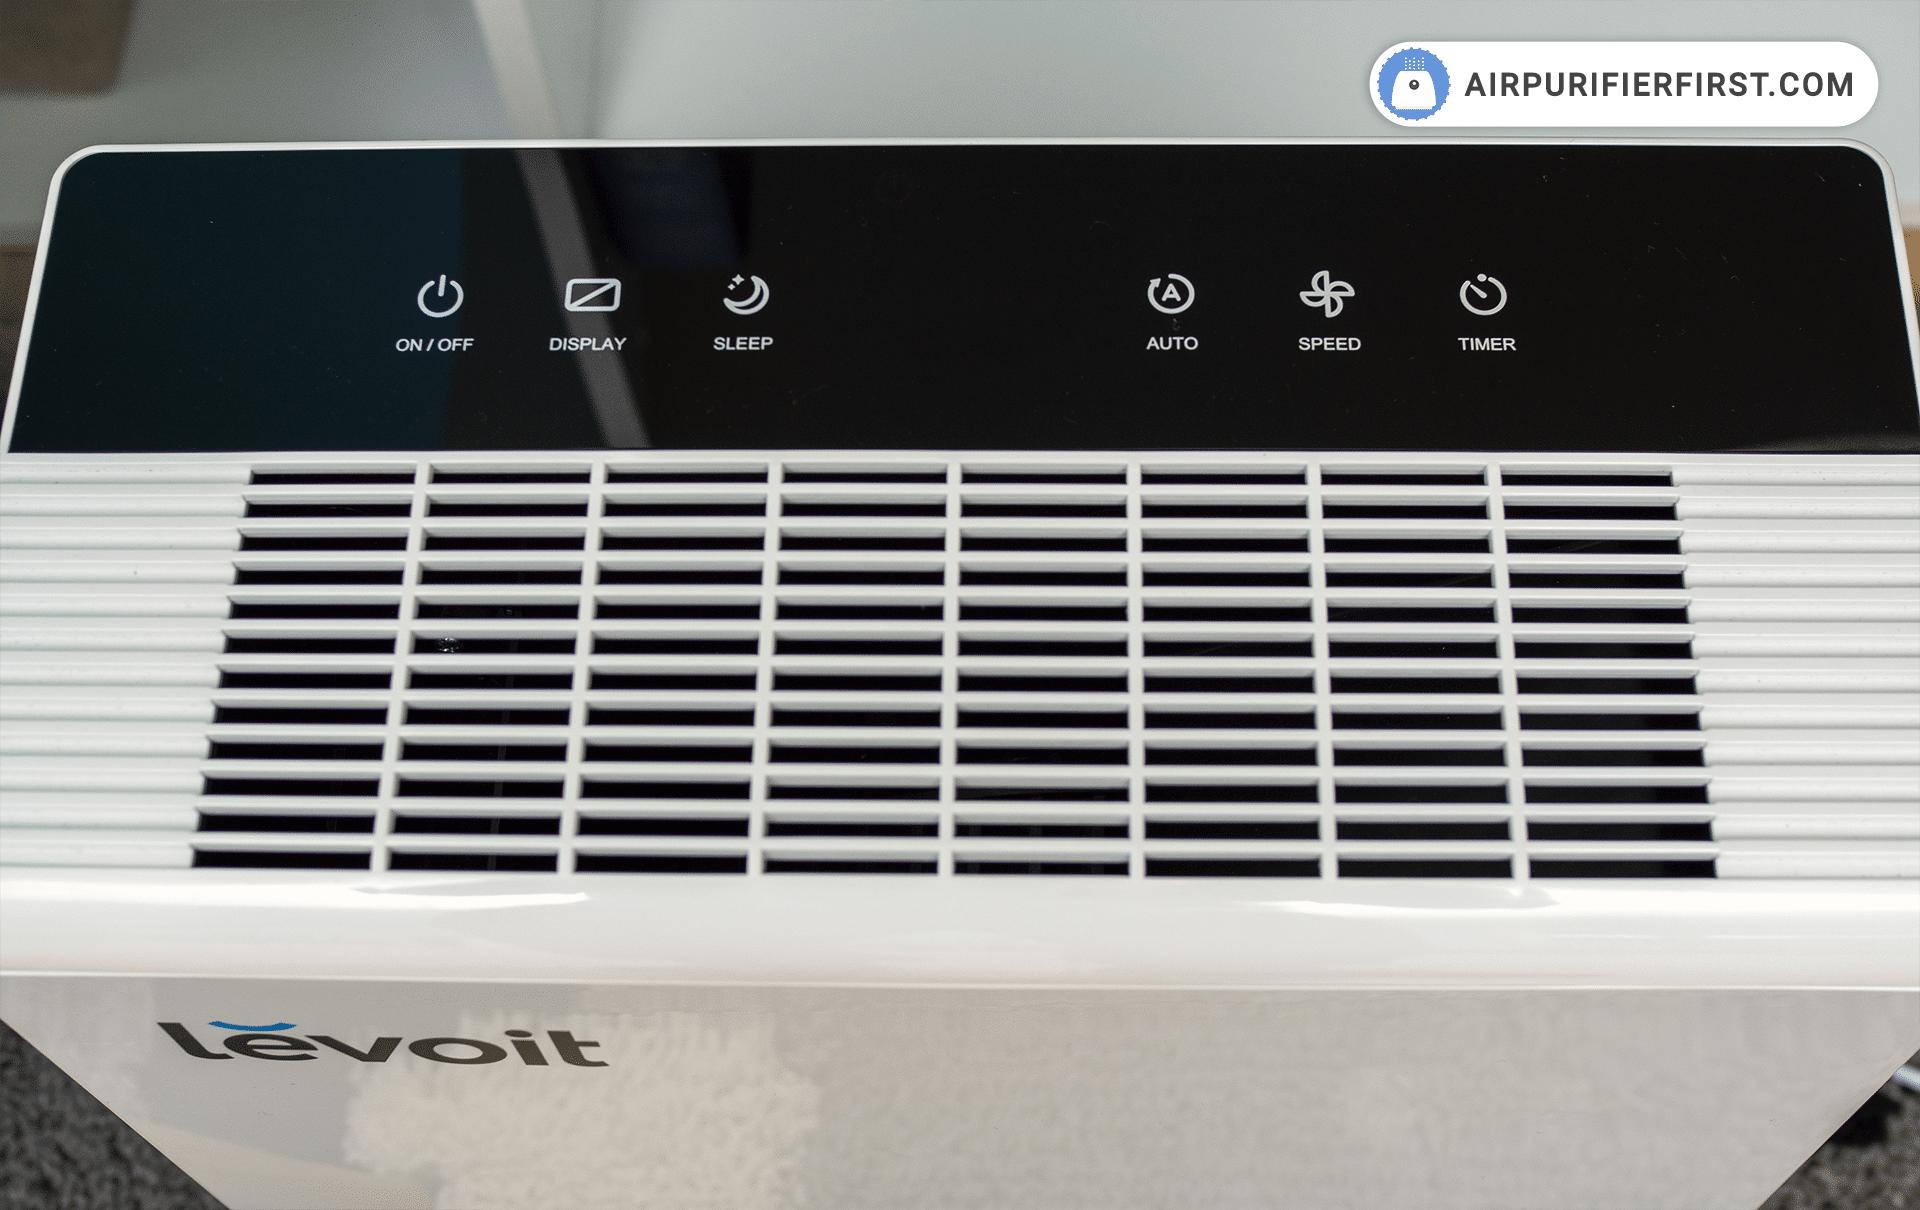 Levoit LV-PUR131 Air Purifier - Control Panel